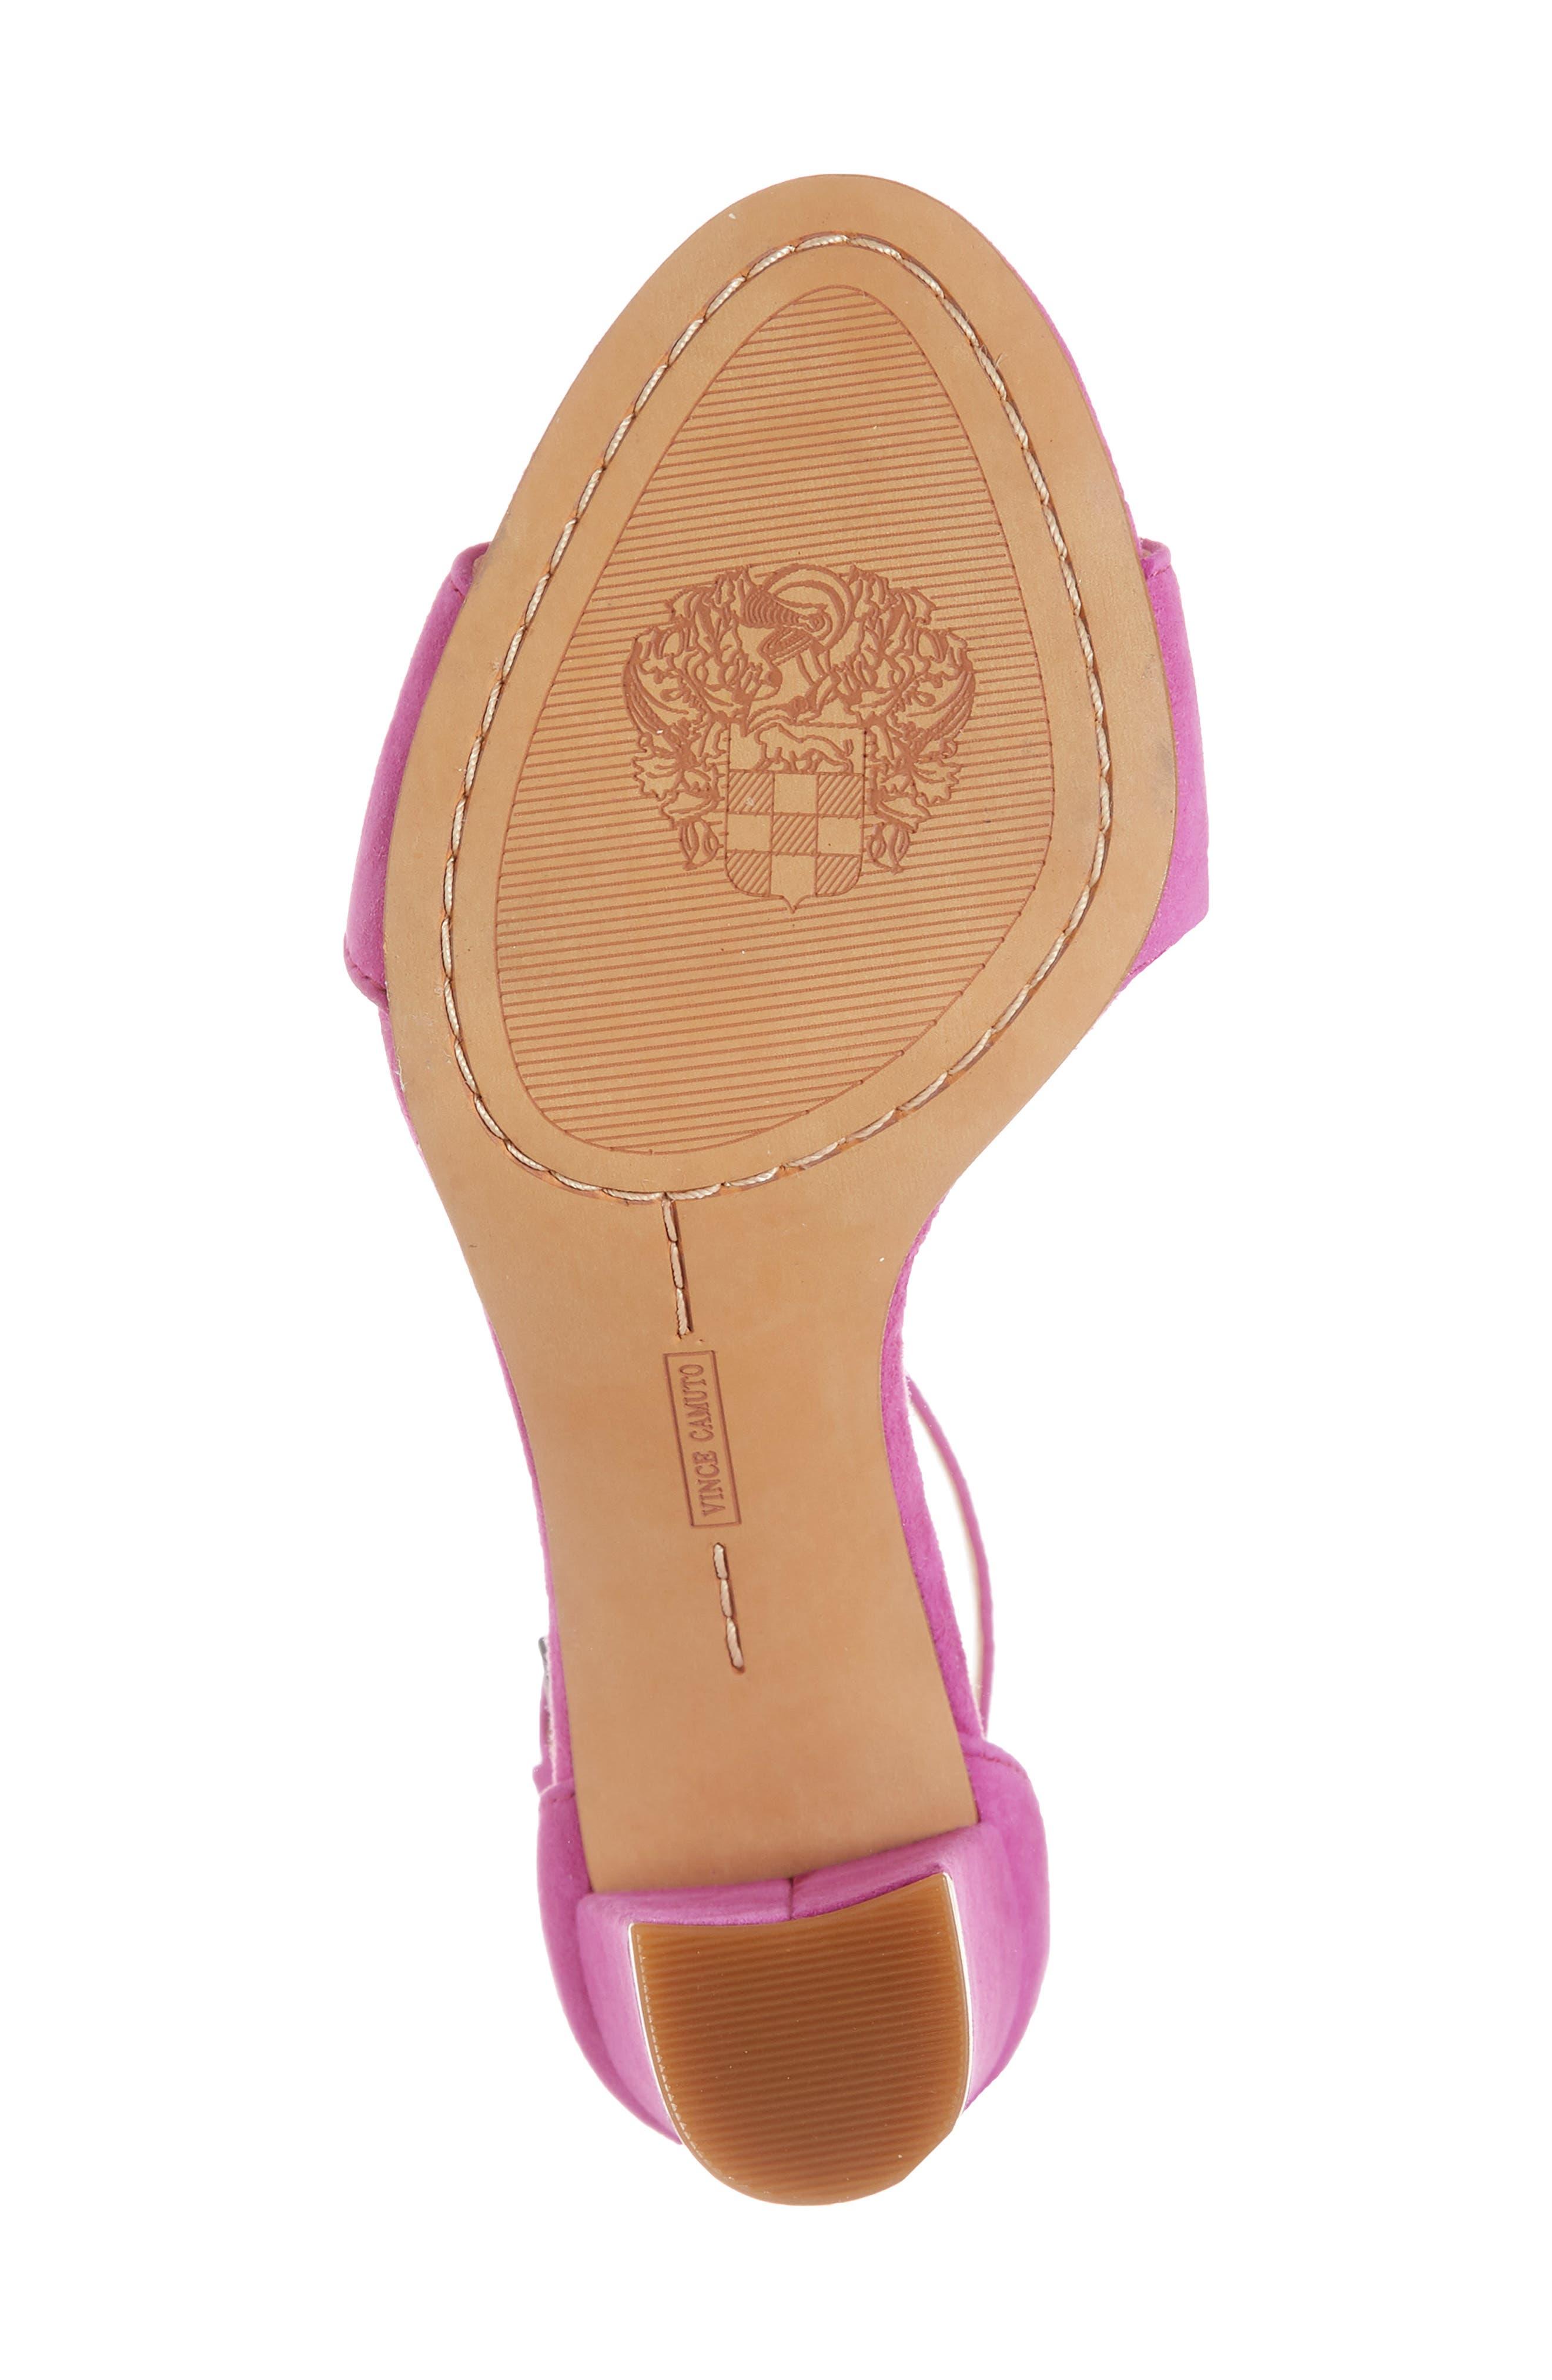 Corlina Ankle Strap Sandal,                             Alternate thumbnail 6, color,                             Drama Pink Suede